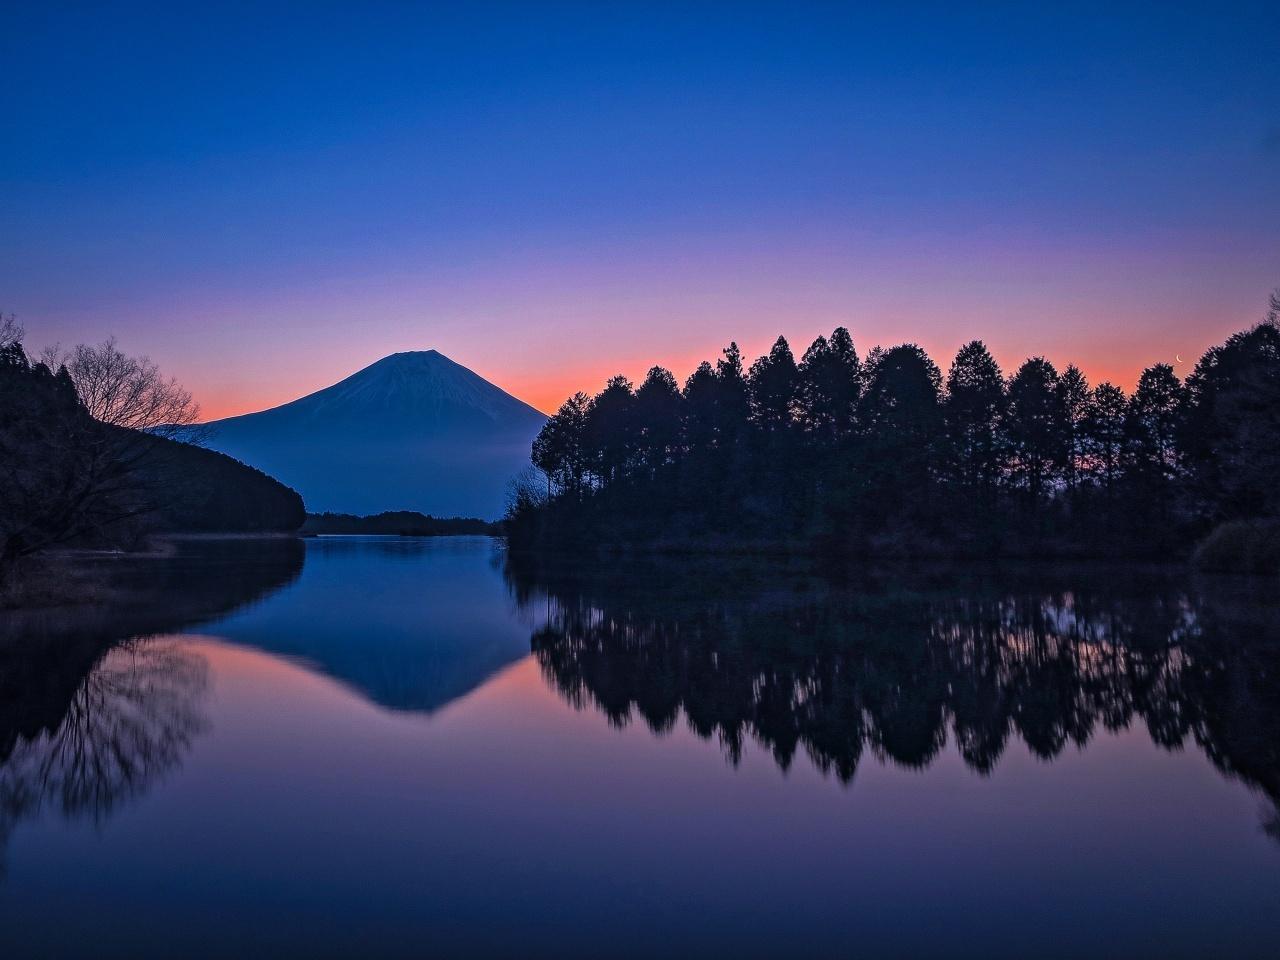 2020.2.21逆さ富士(田貫湖)_e0321032_16392462.jpg